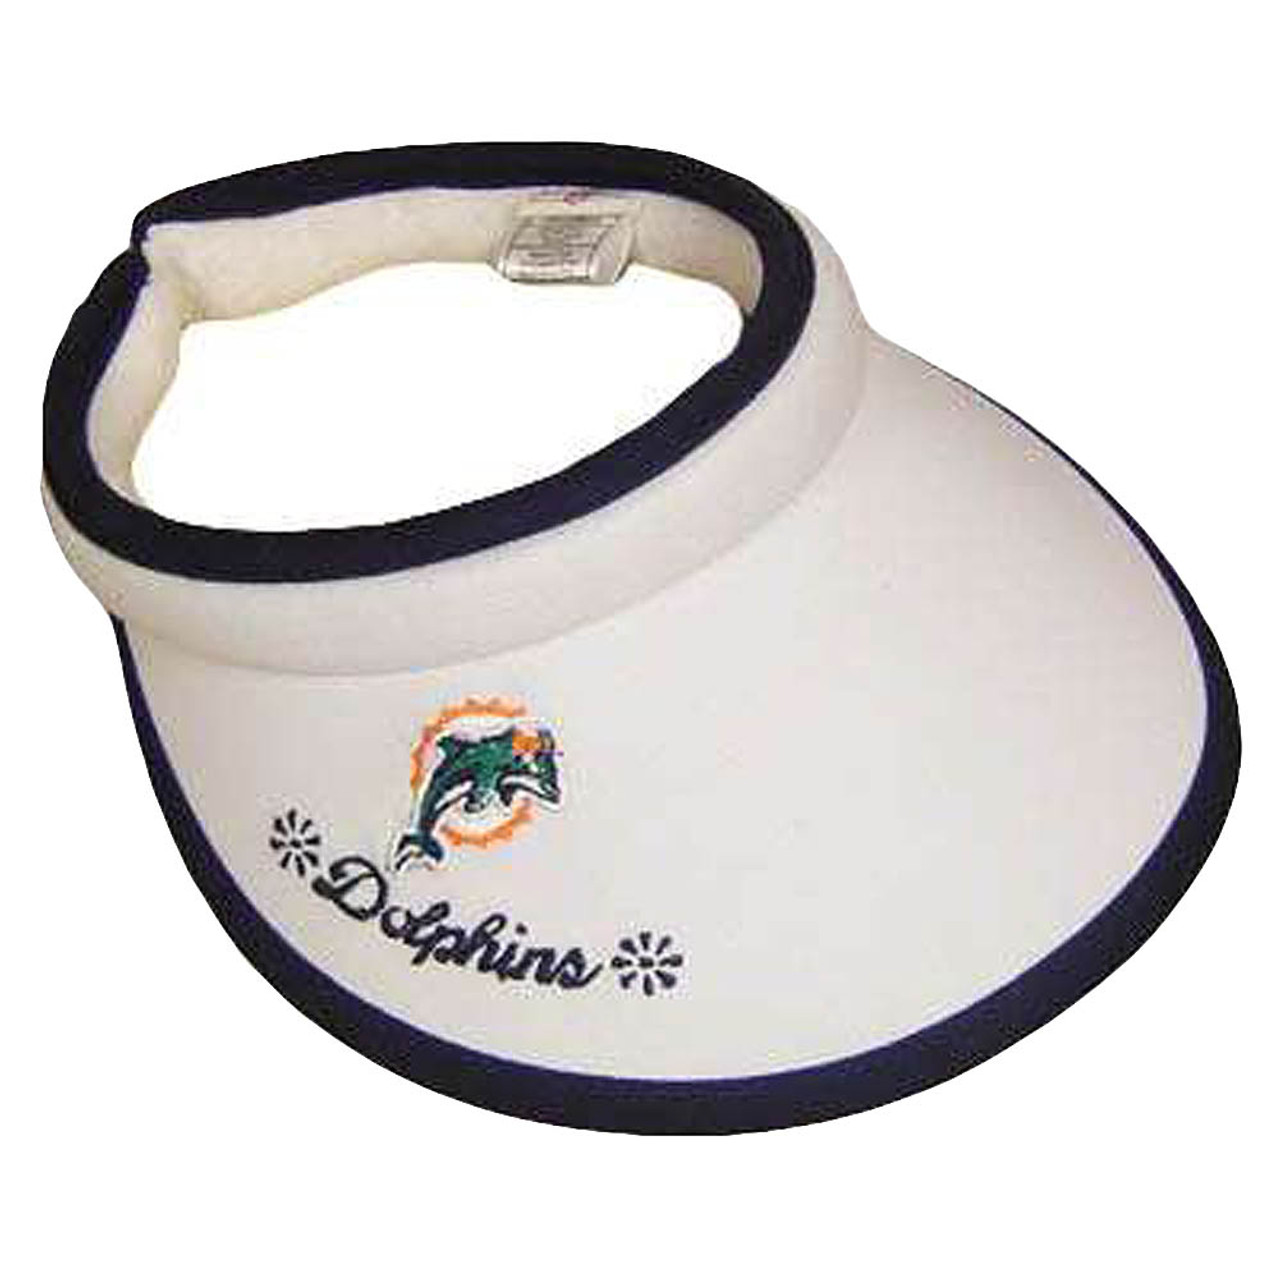 NFL Miami Dolphins Misty Women White Blue Visor Golf Tennis - Sinbad Sports  Store 1b3cc3afd